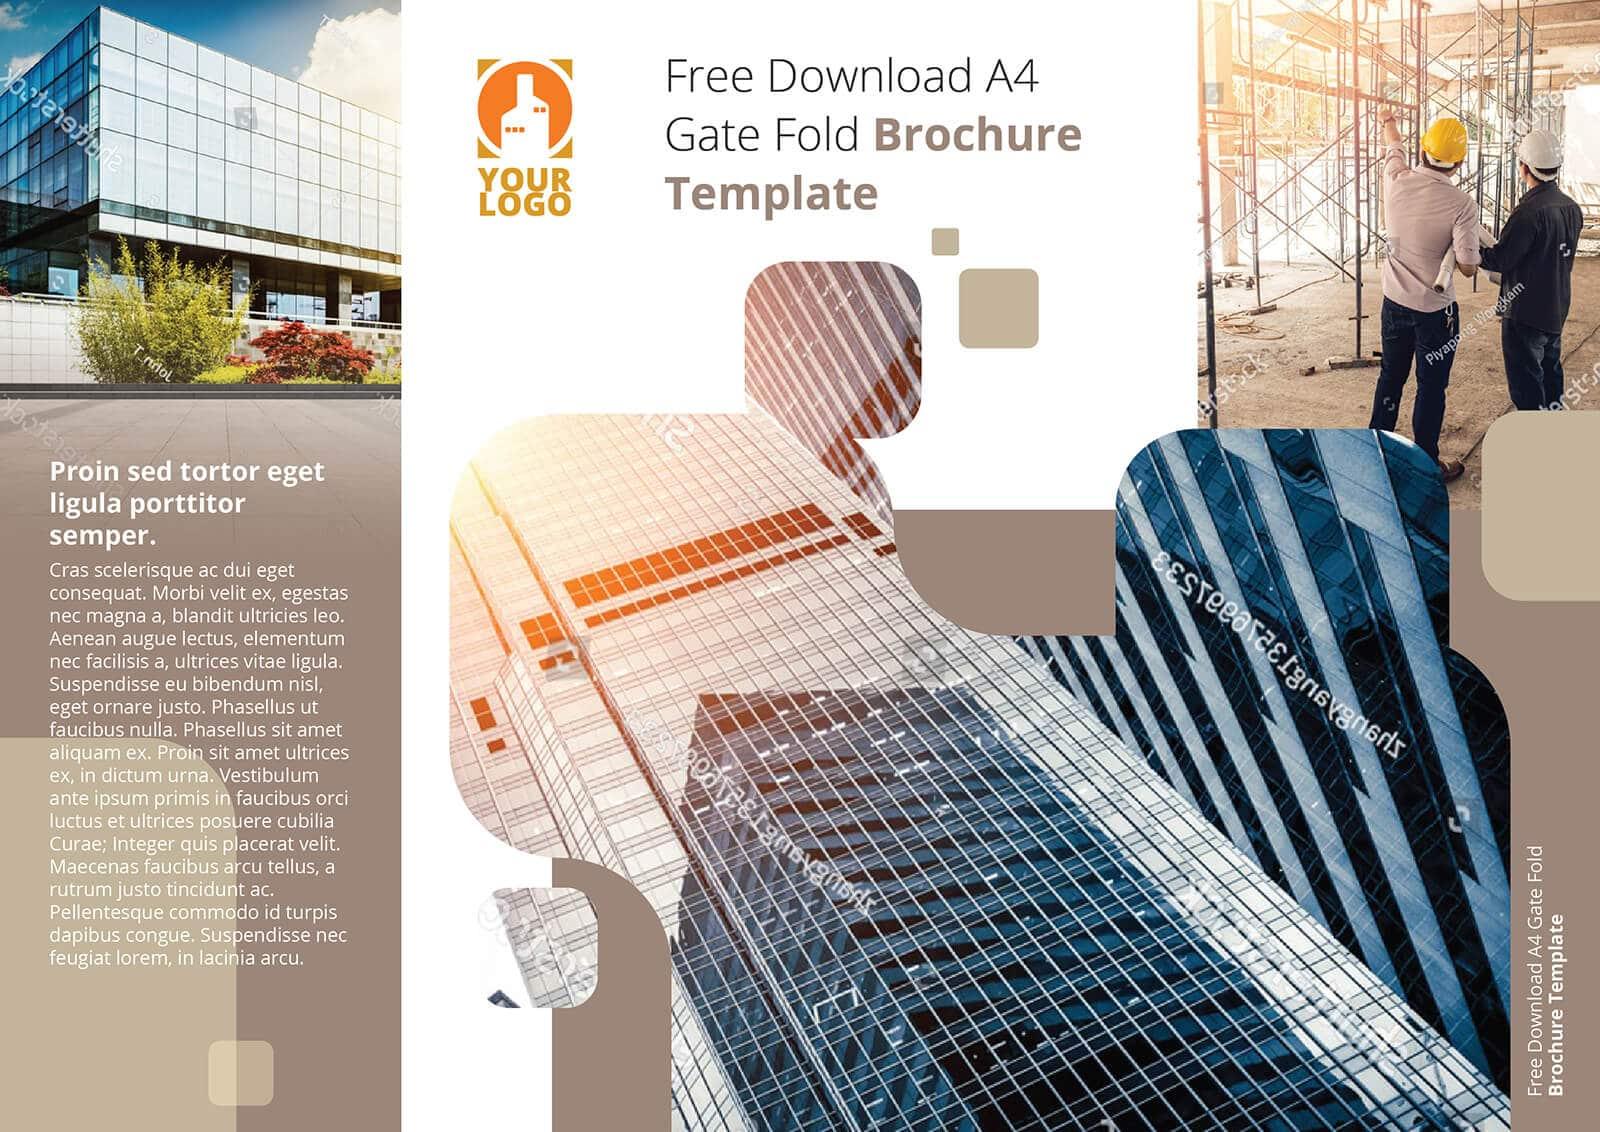 Free Download A4 Gate Fold Brochure Template Plain 01